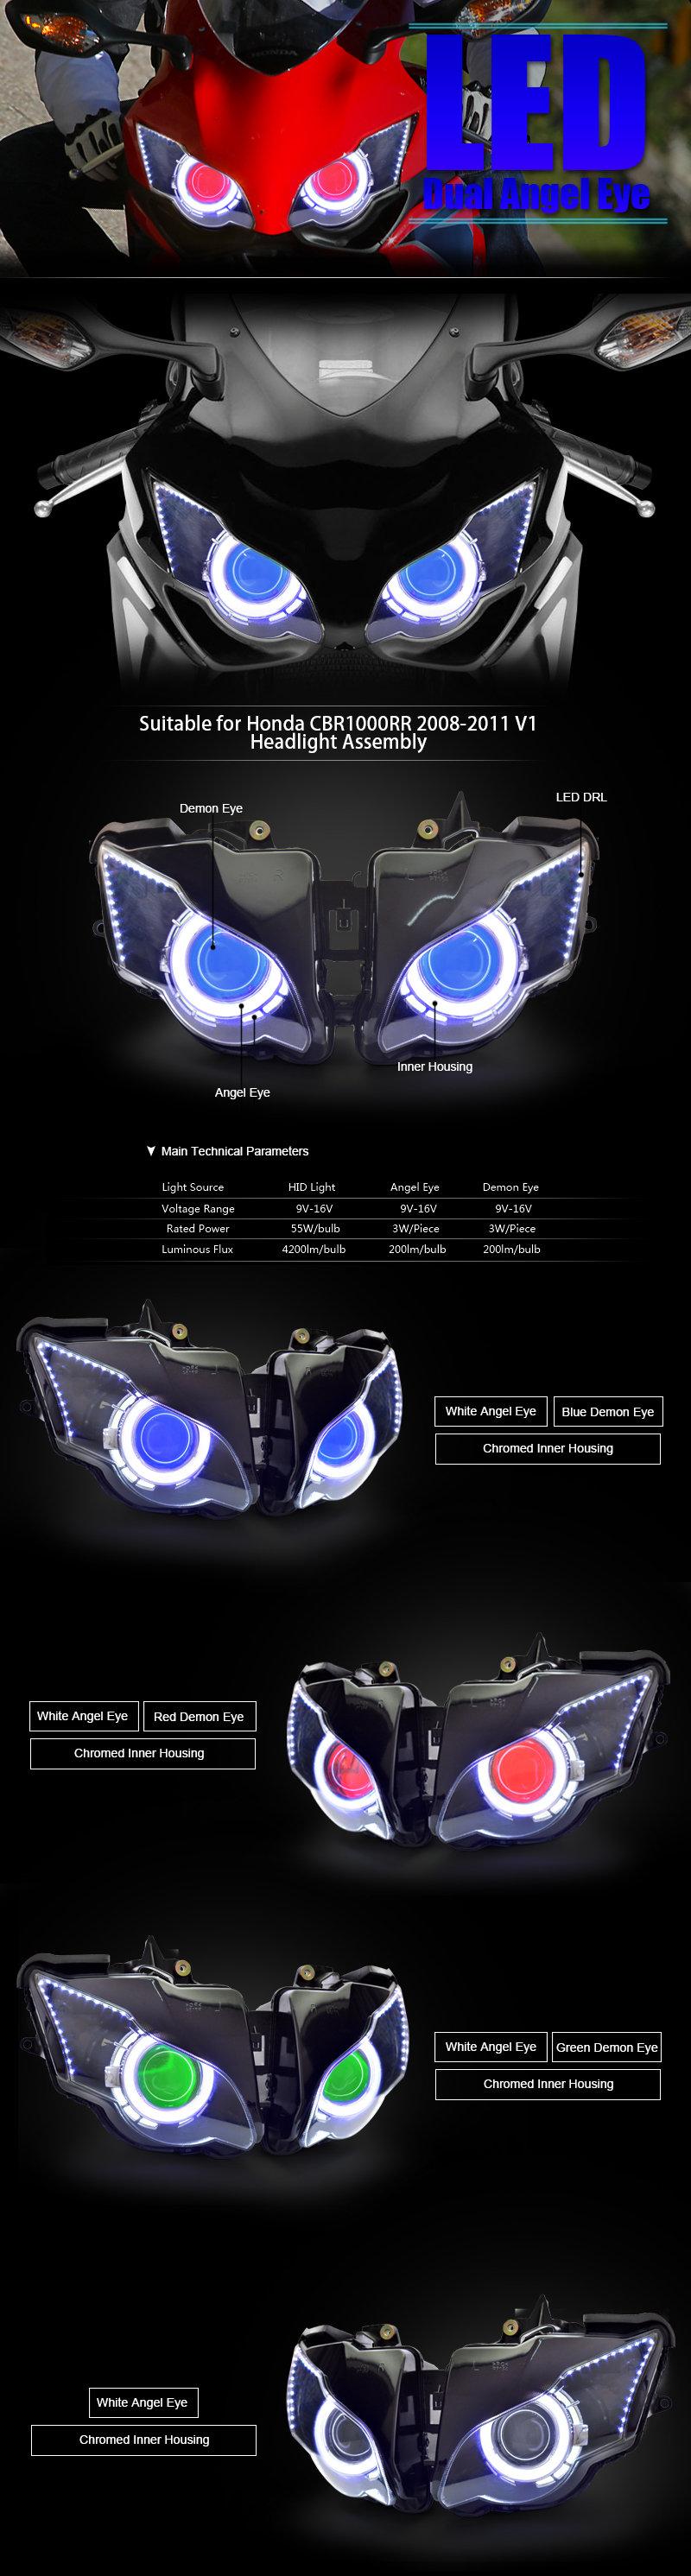 Honda CBR1000RR LED Headlight 2008 2009 2010 2011